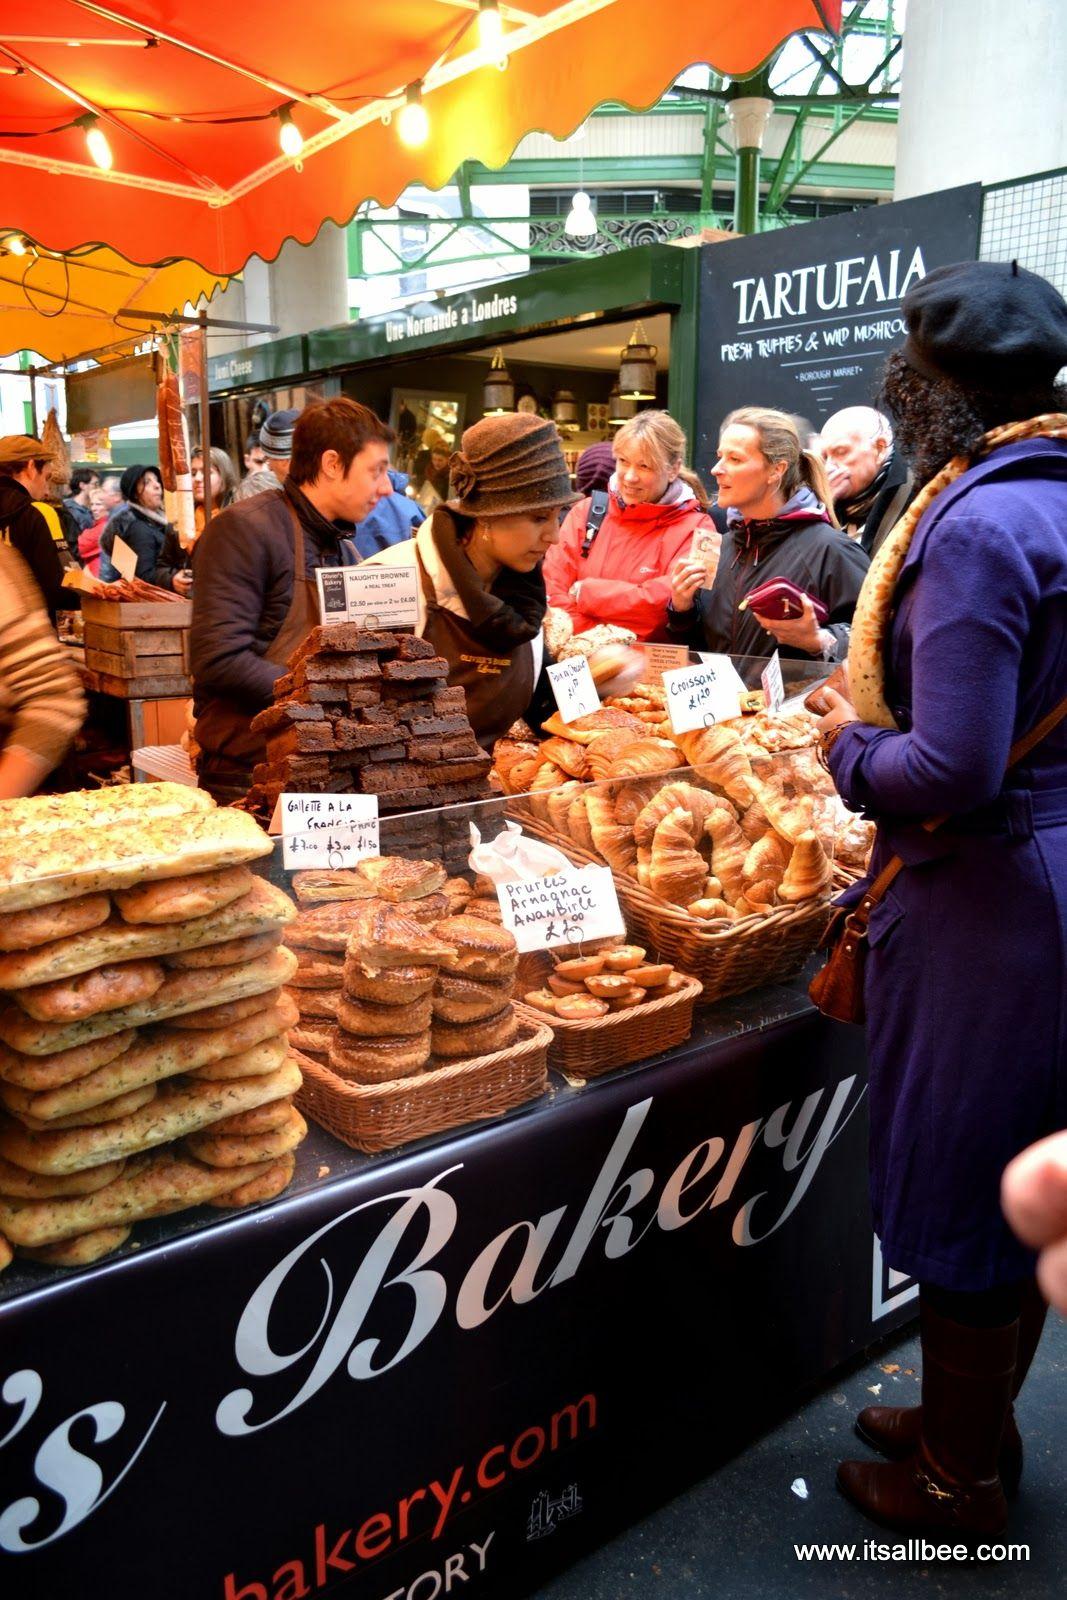 Borough market guide exploring london through food